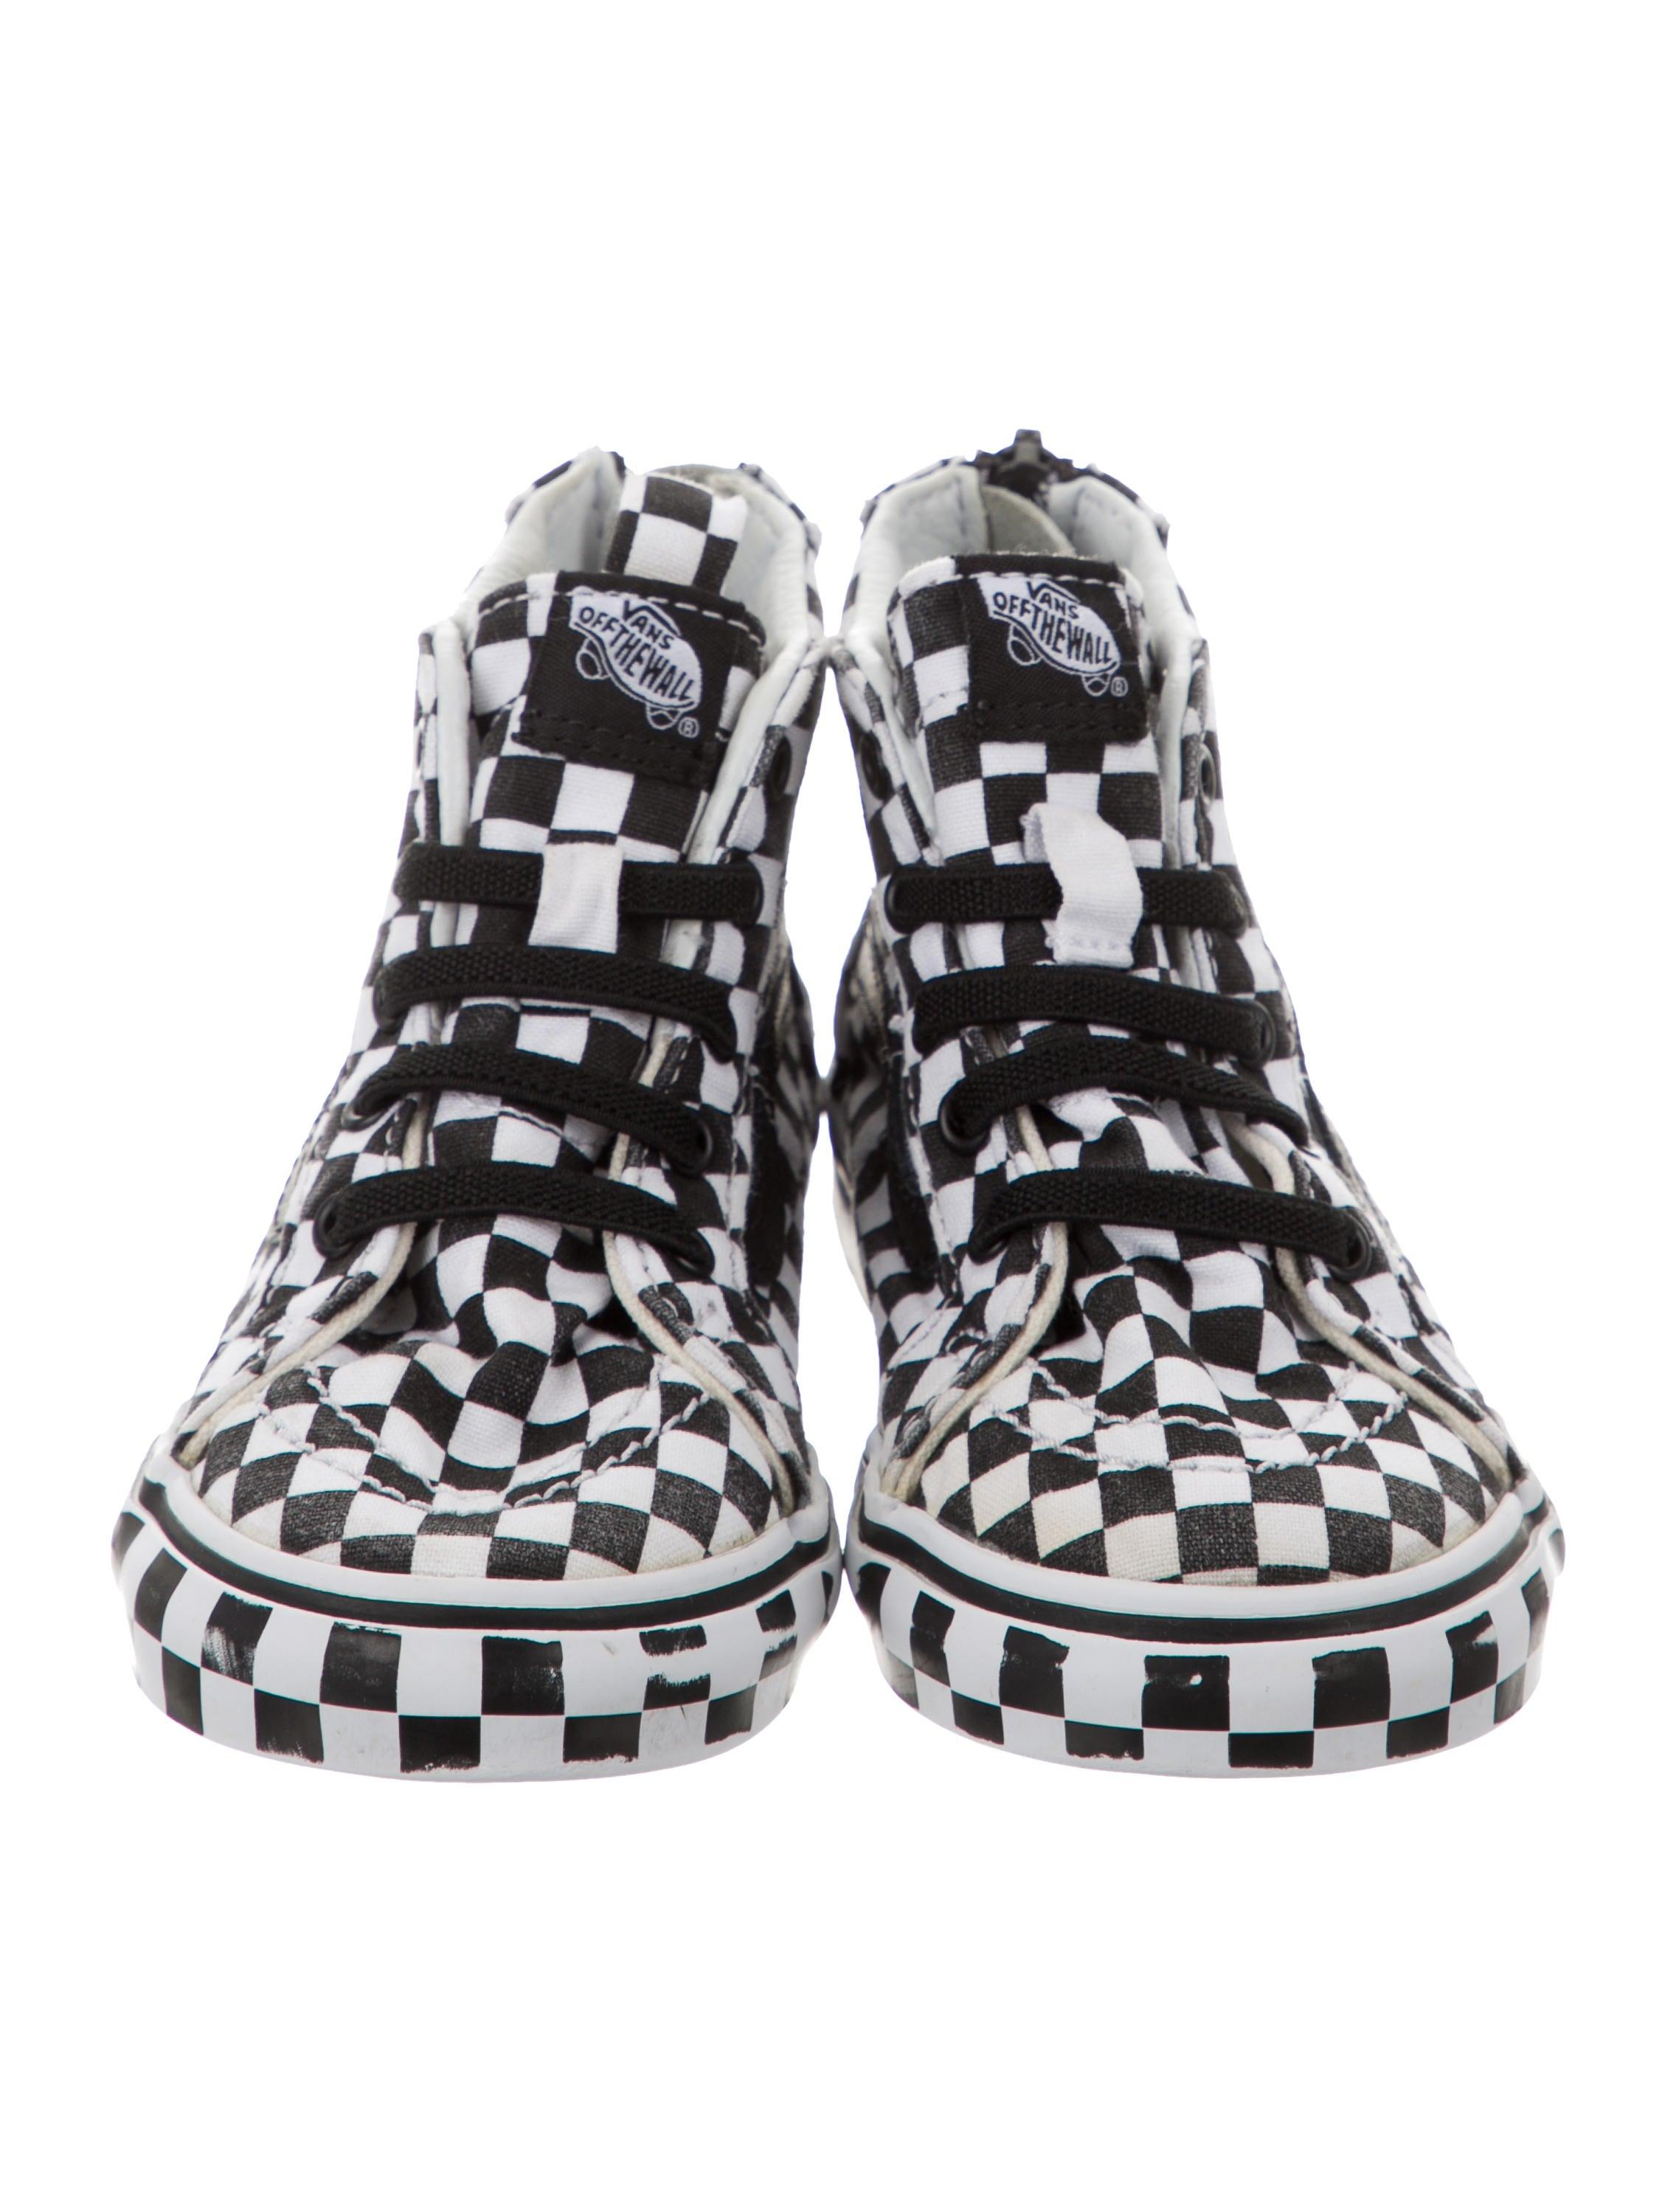 Vans Toddler Kids' Checkerboard High